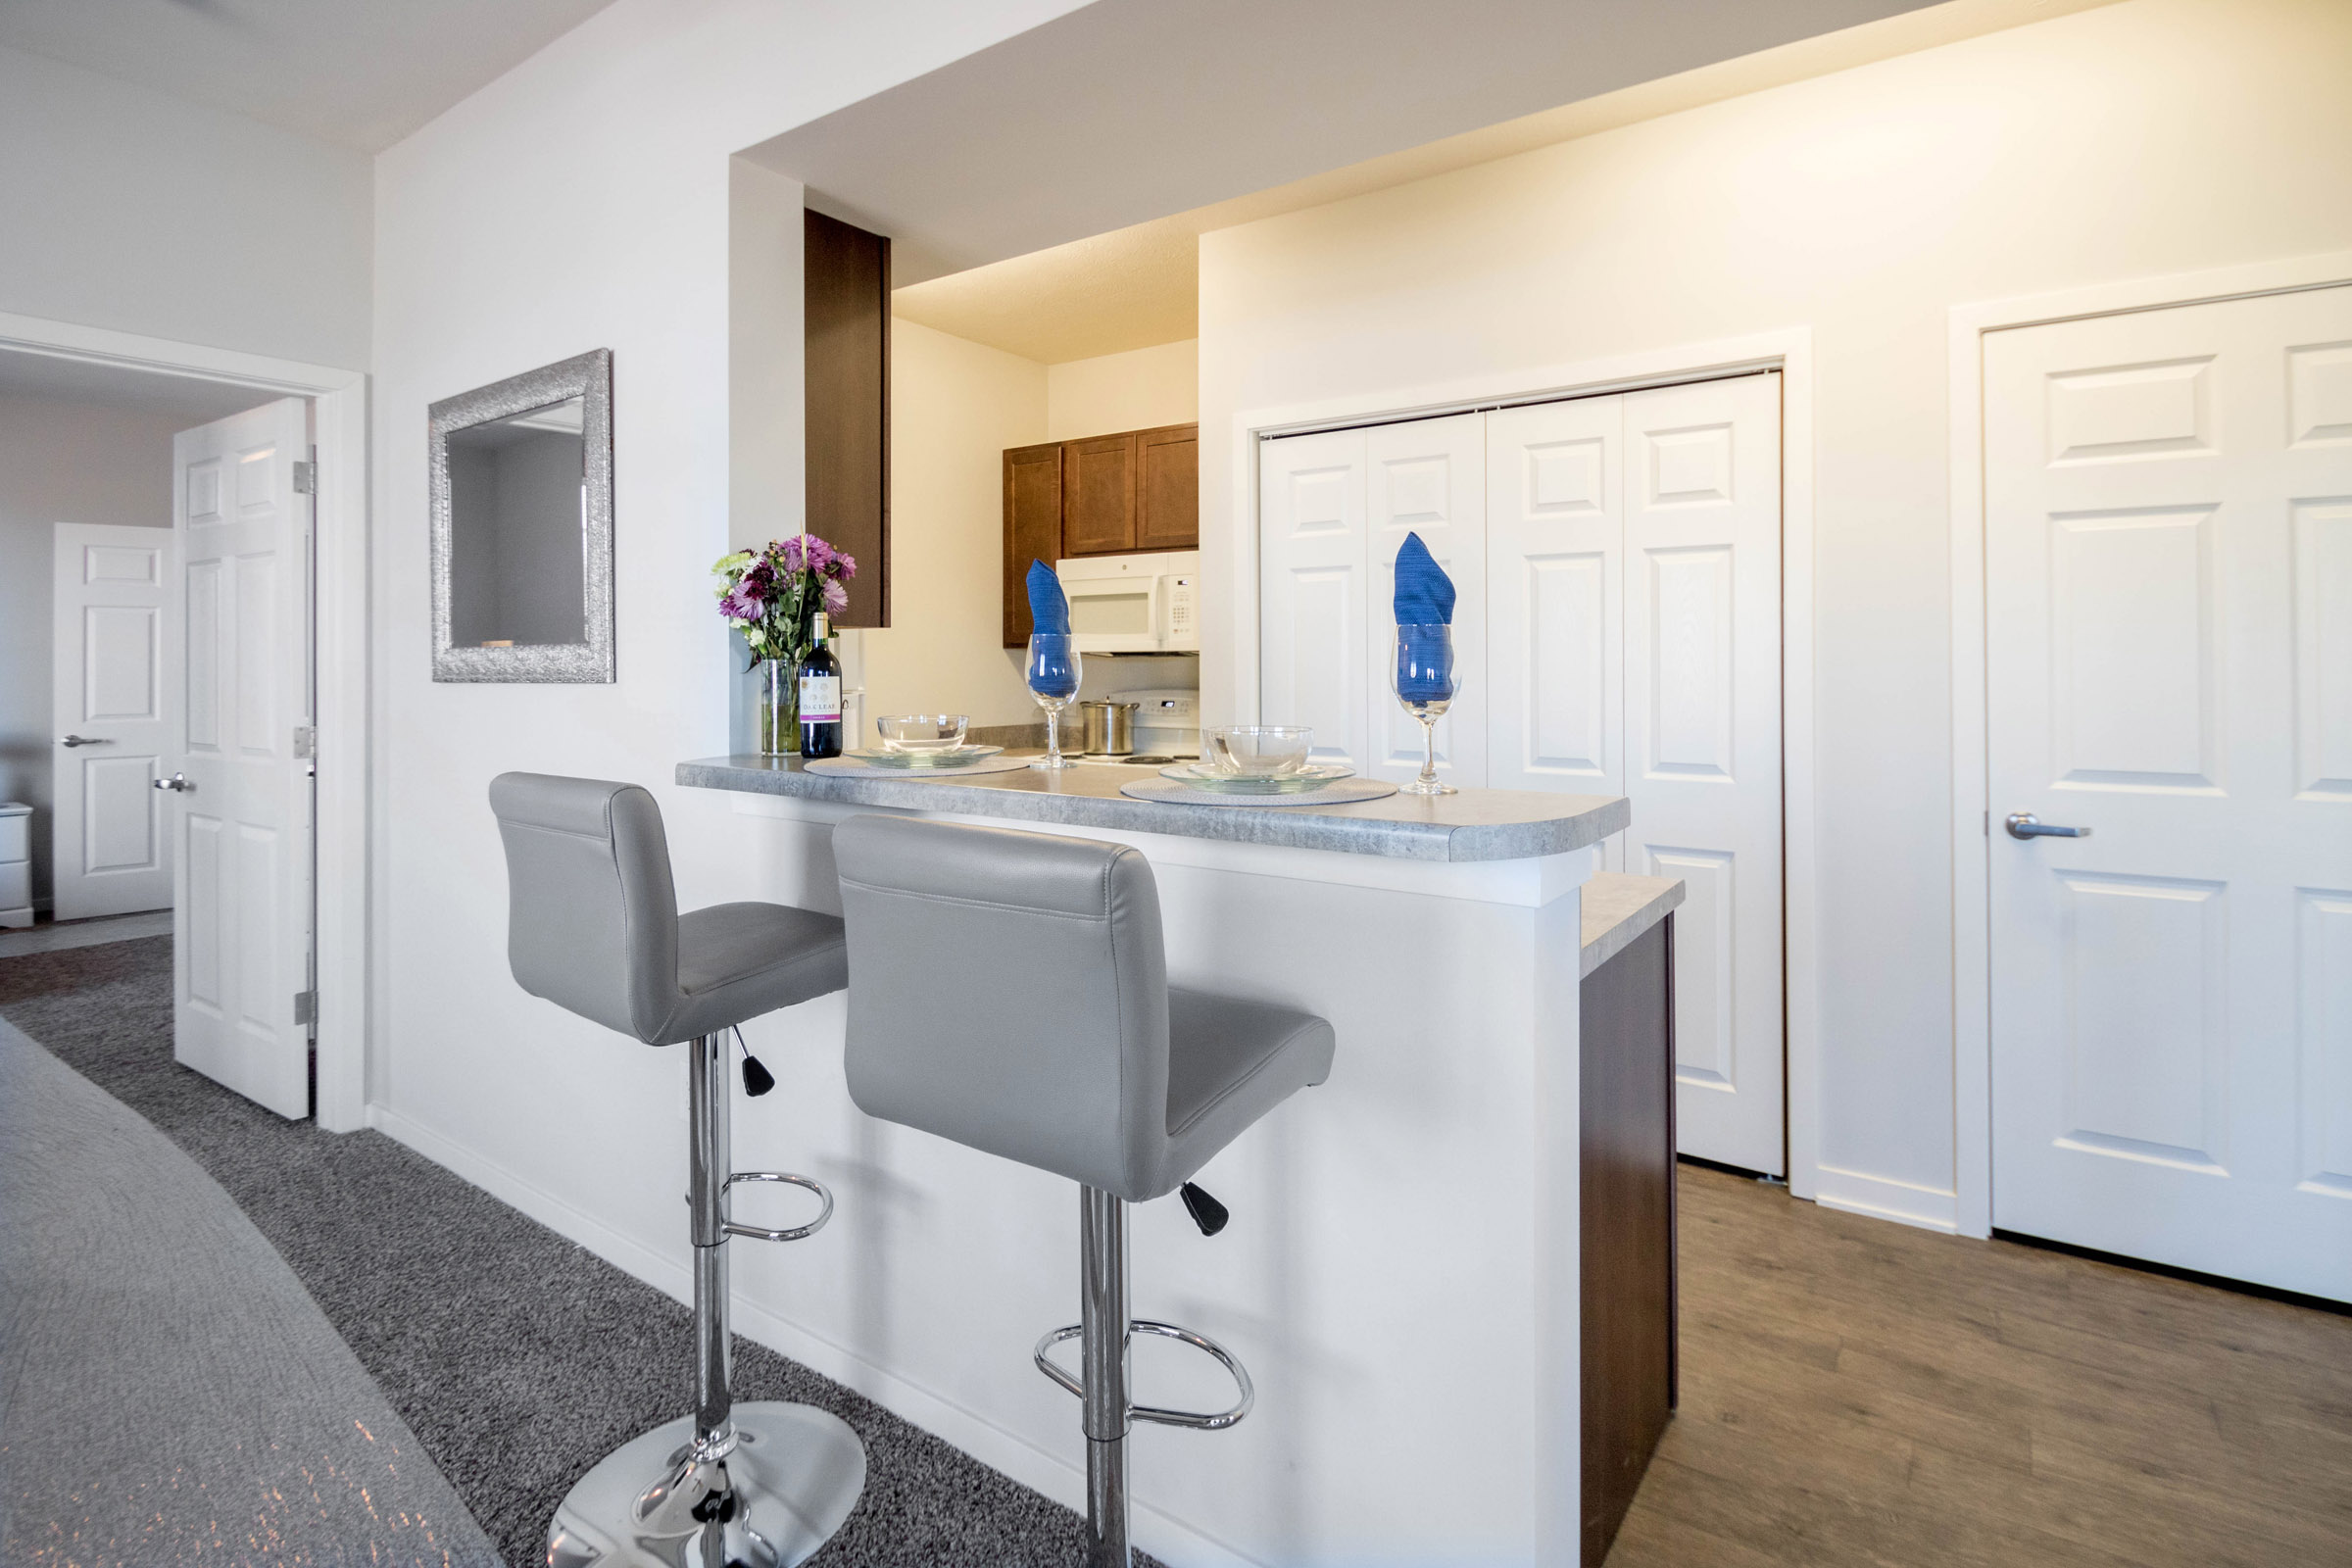 Open Kitchen Layout at Aspen Grove Apartments in Omaha, NE